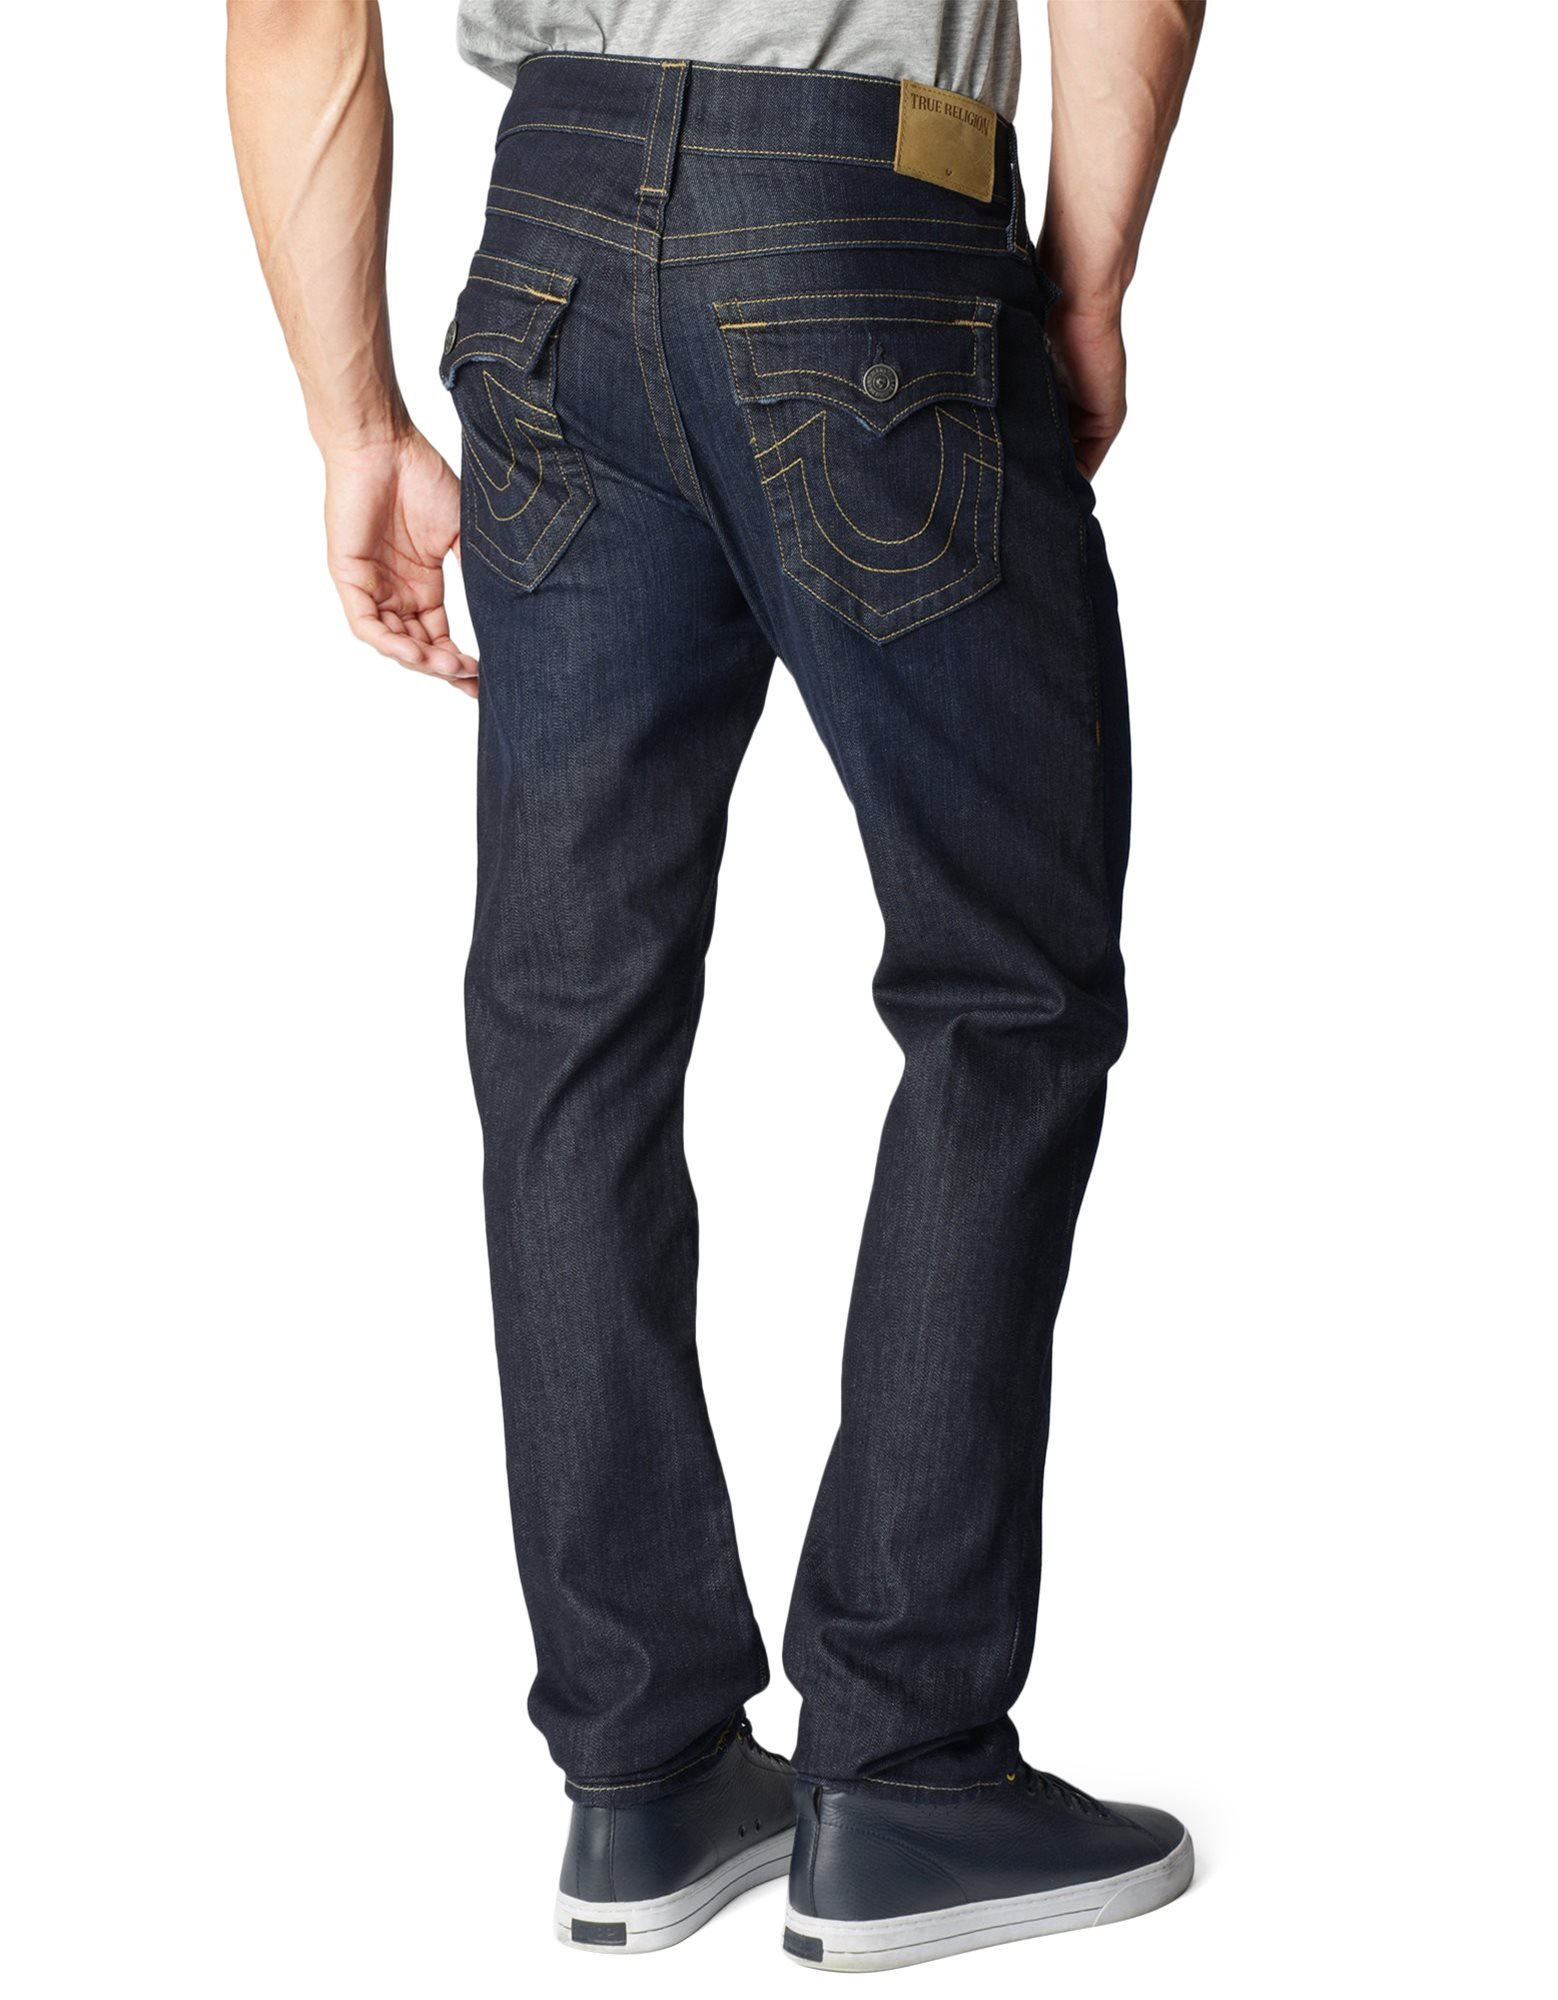 True Religion Men's Geno W Flap Slim Jean, Wanted Man, 40 by True Religion (Image #2)